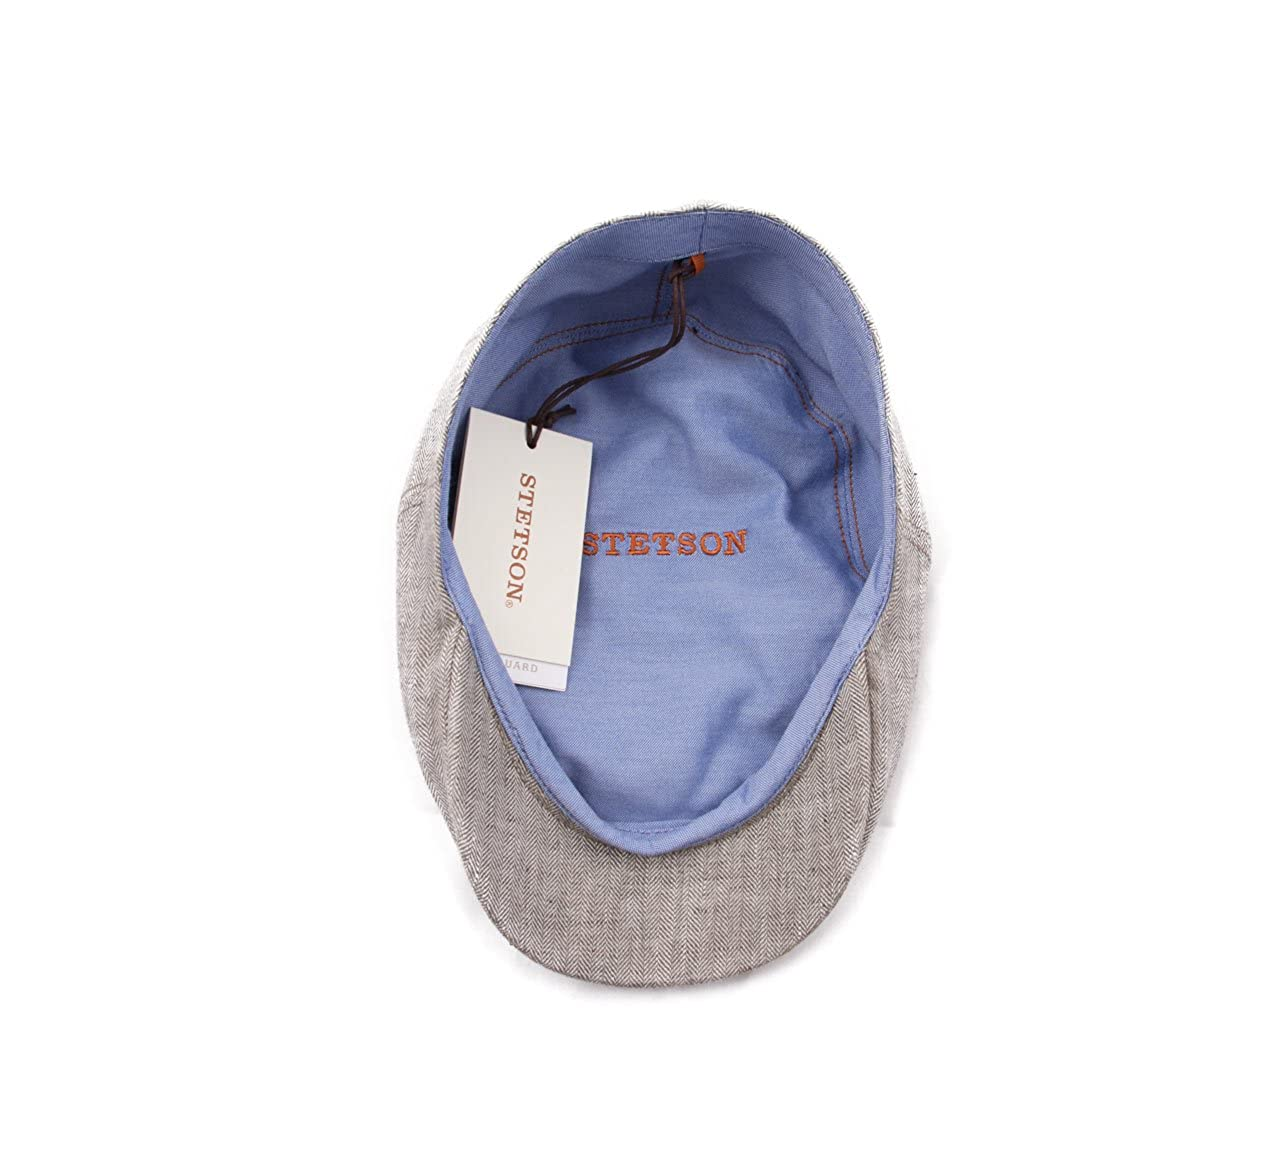 bc919007f62 Stetson Men s Ivy Cap Linen Fischgrat Flat Cap at Amazon Men s Clothing  store